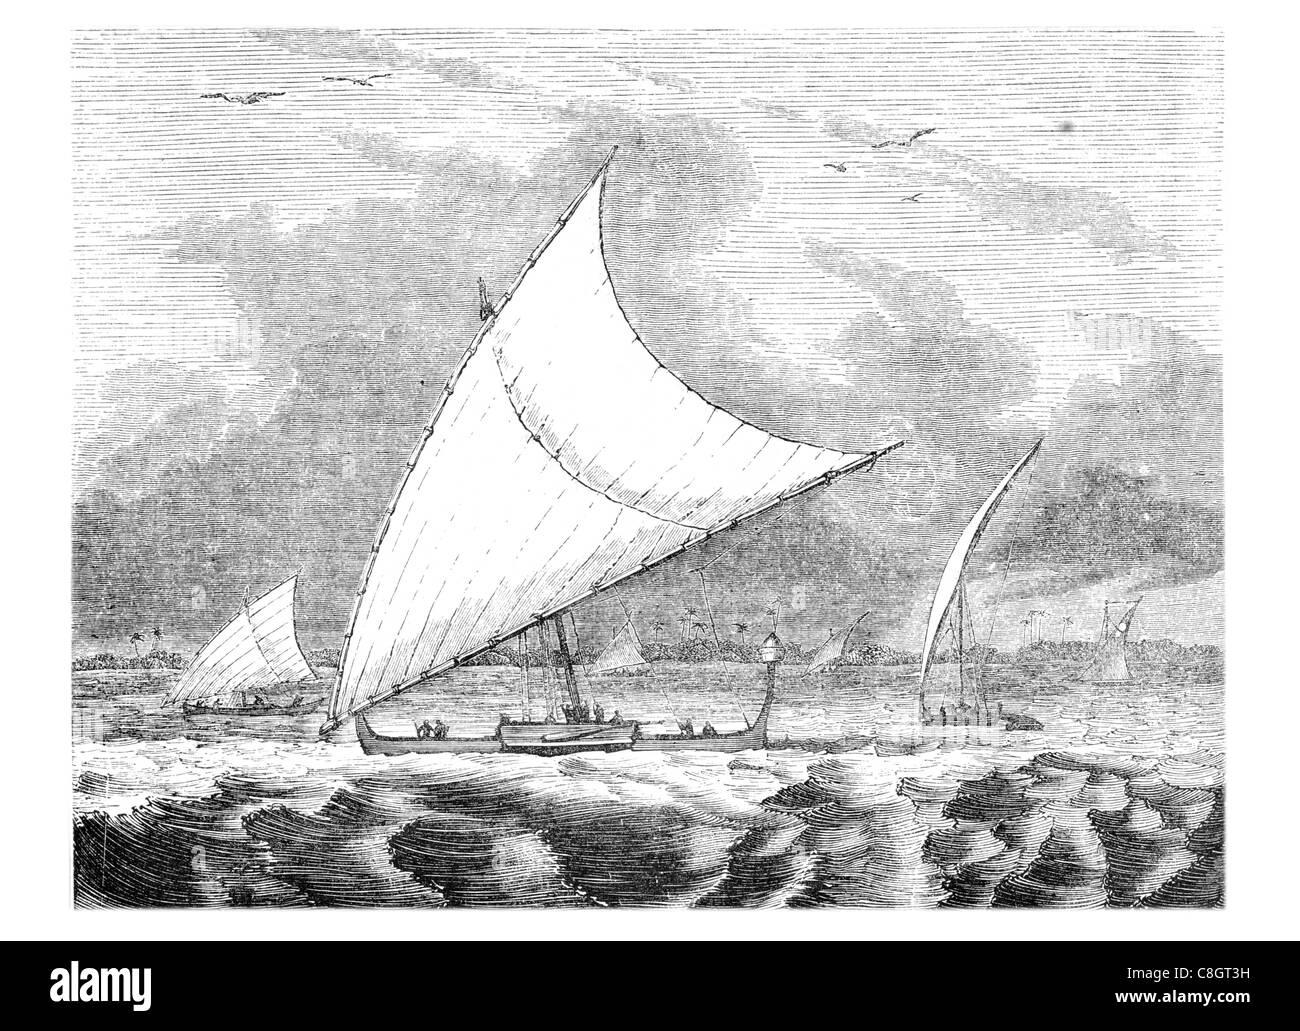 flying proas Ladrone Islands proa prau perahu prahu multihull sailing vessel sail sailing sailor ship ships shipping - Stock Image